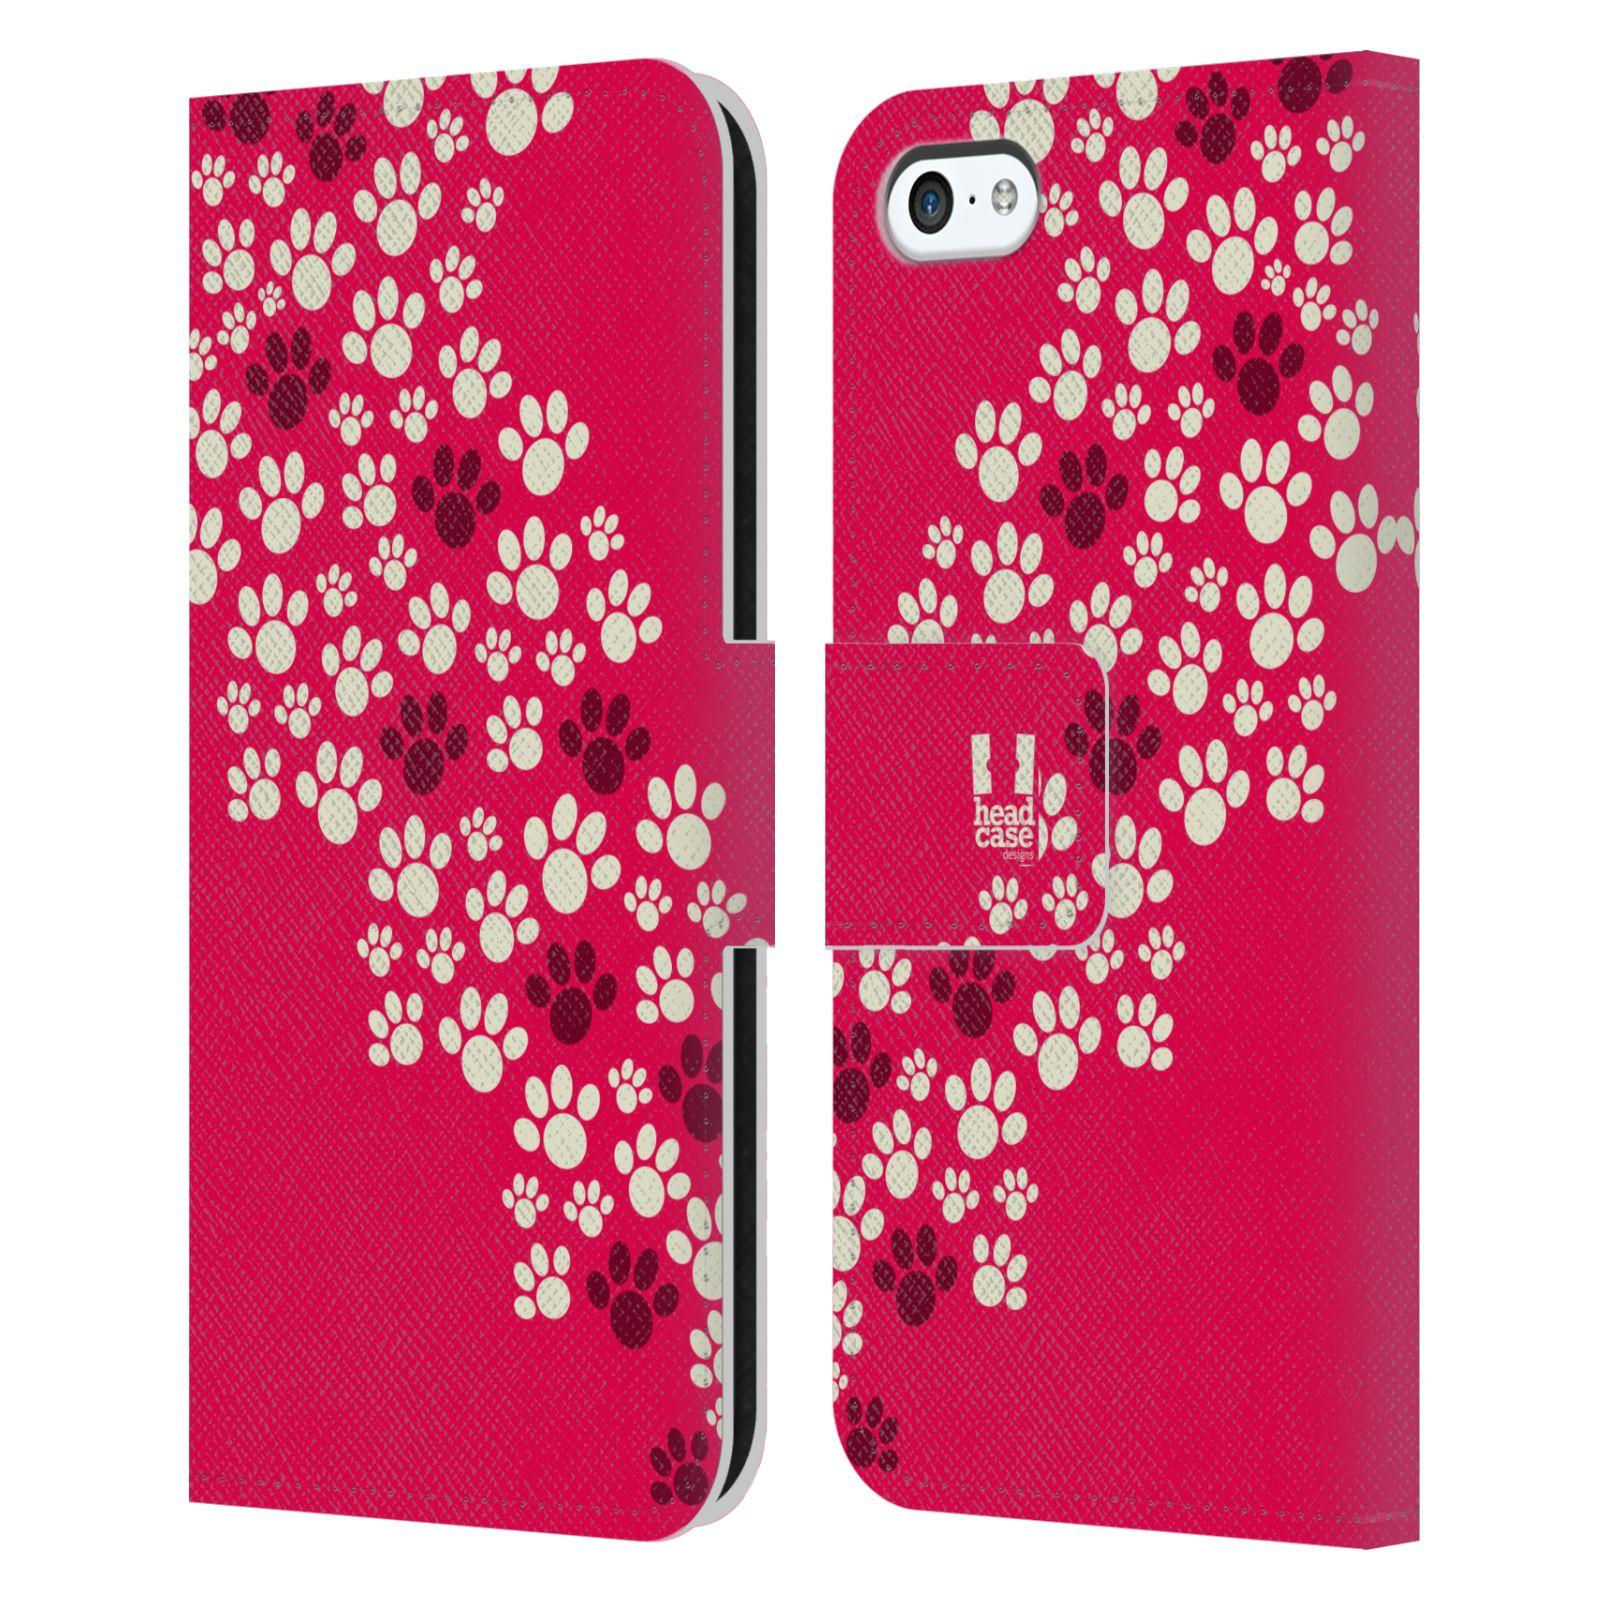 HEAD CASE Flipové pouzdro pro mobil Apple Iphone 5C Pejsek ťapky růžová barva